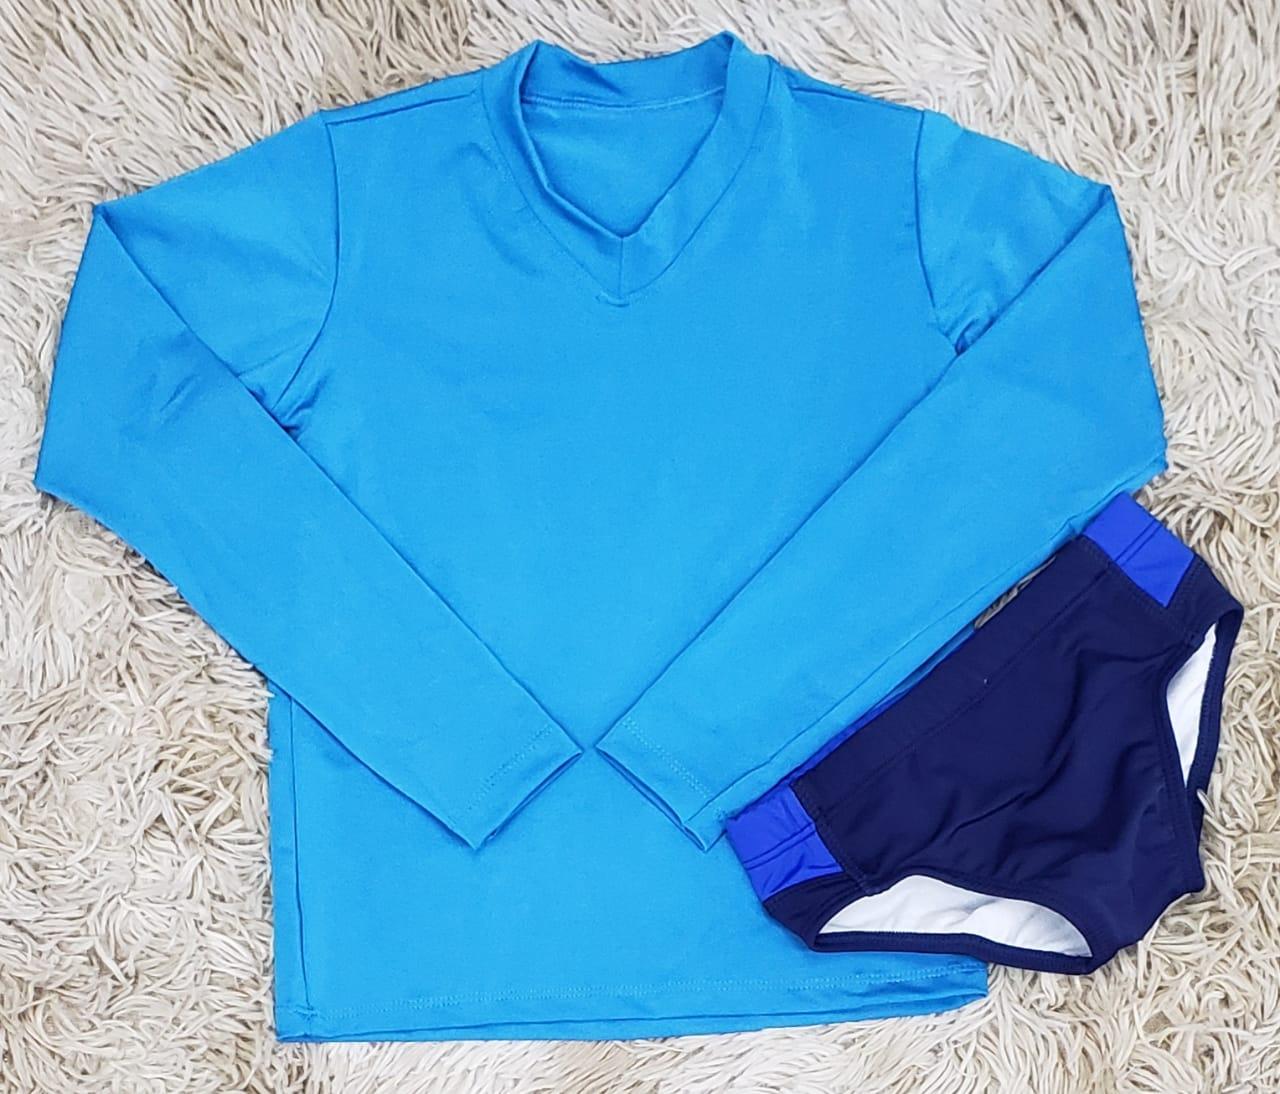 Camiseta Manga Longa UV Azul Claro com Sunga